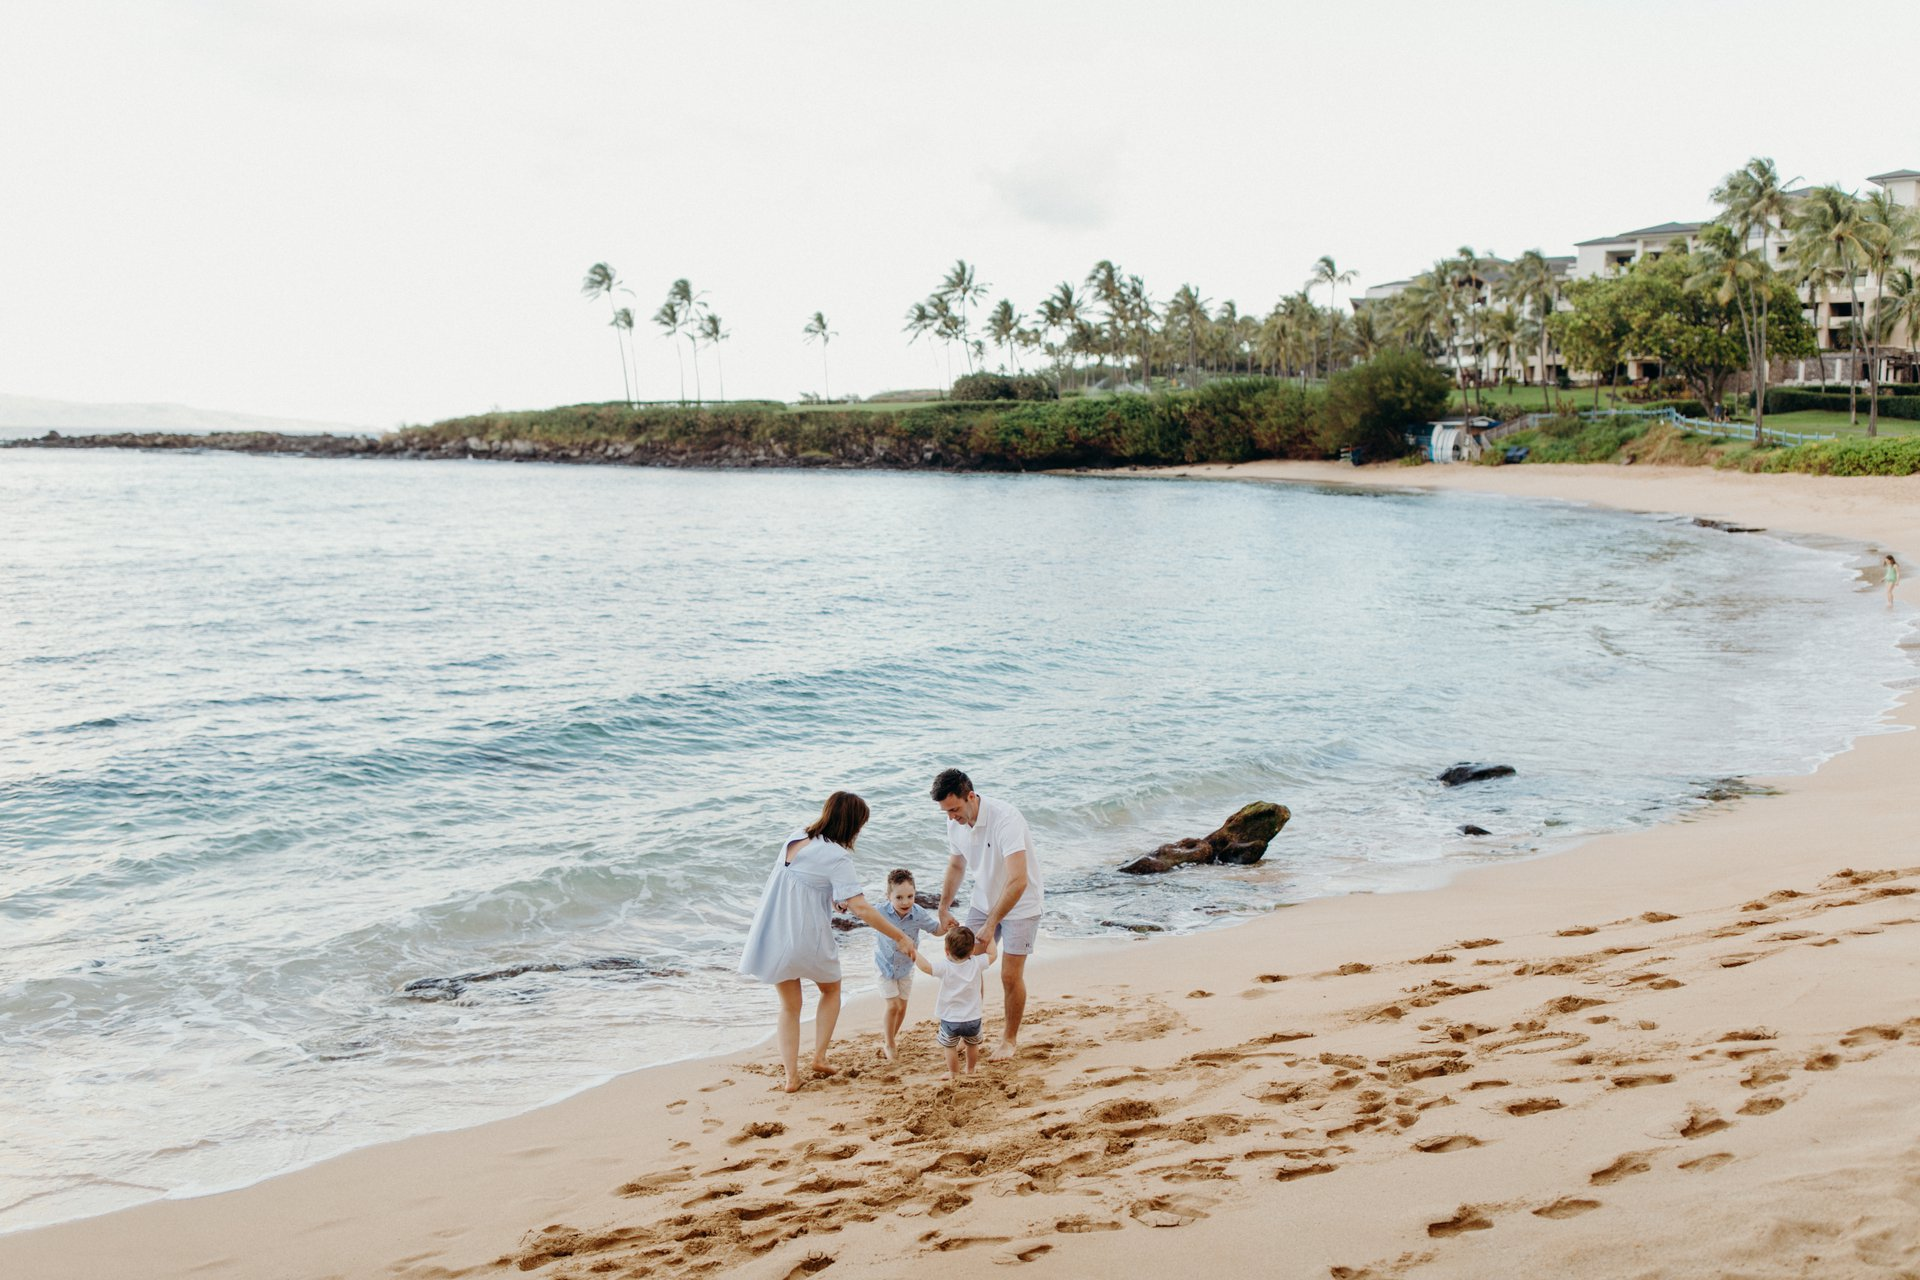 Maui-USA-travel-story-Flytographer-35